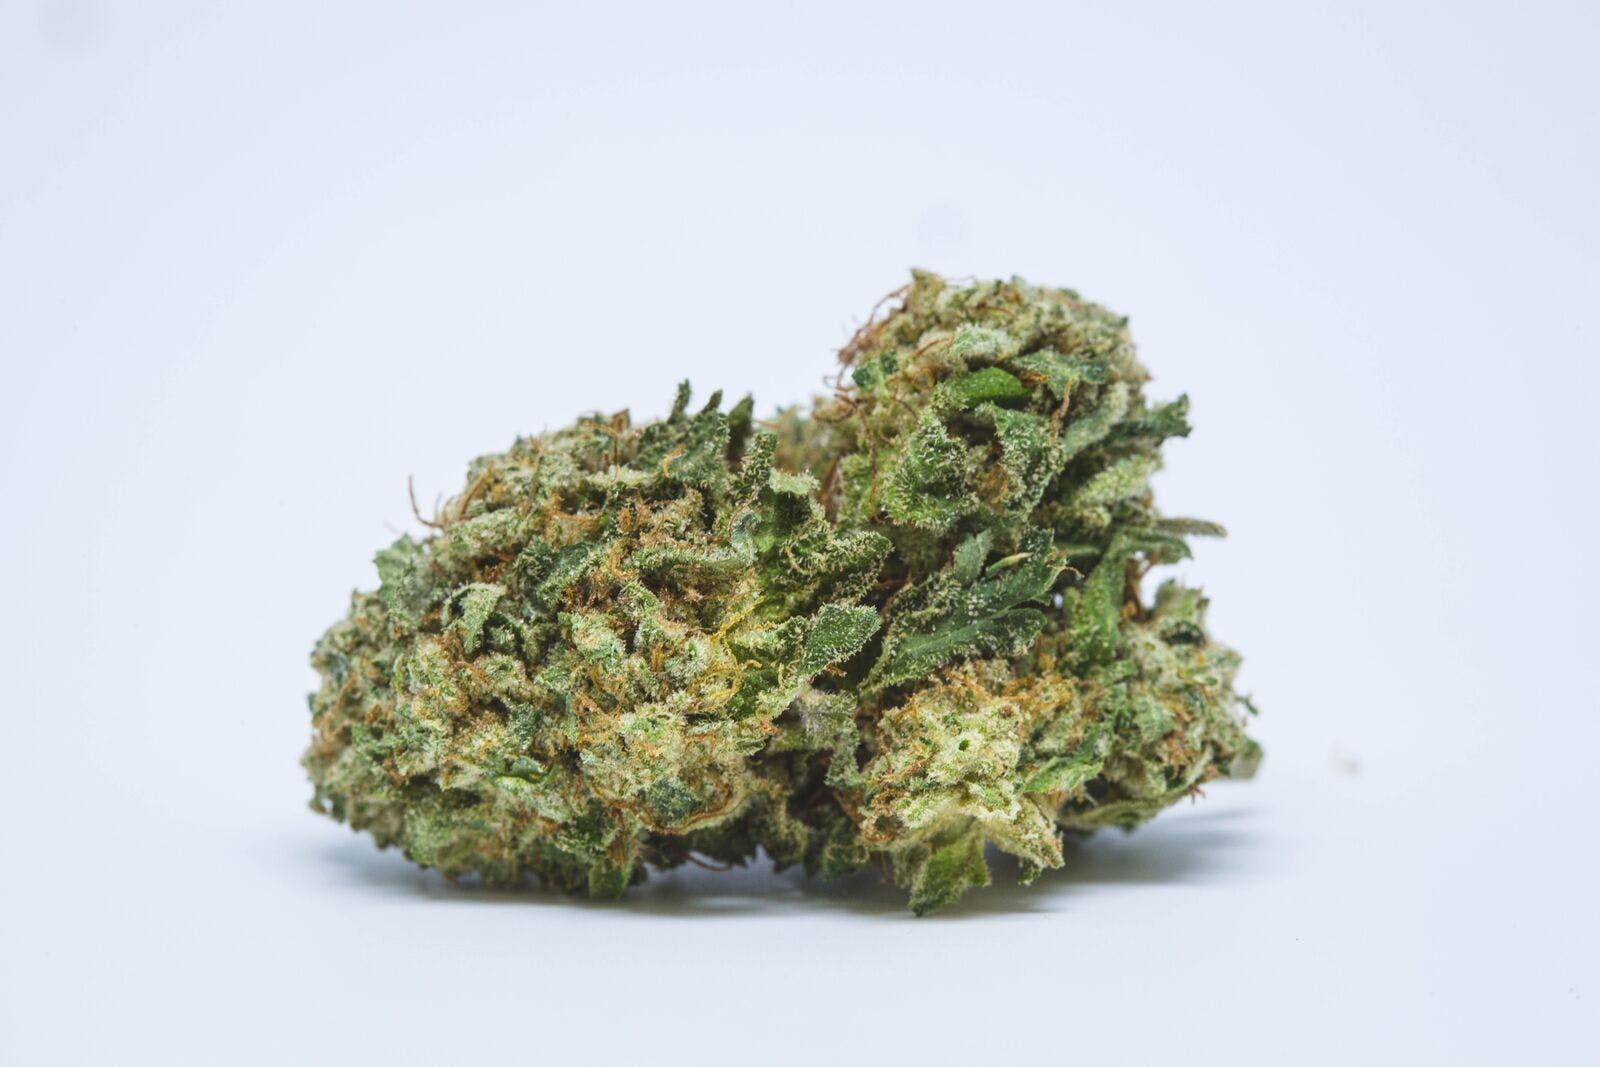 Green Haze Weed; Green Haze Cannabis Strain; Green Haze Sativa Marijuana Strain